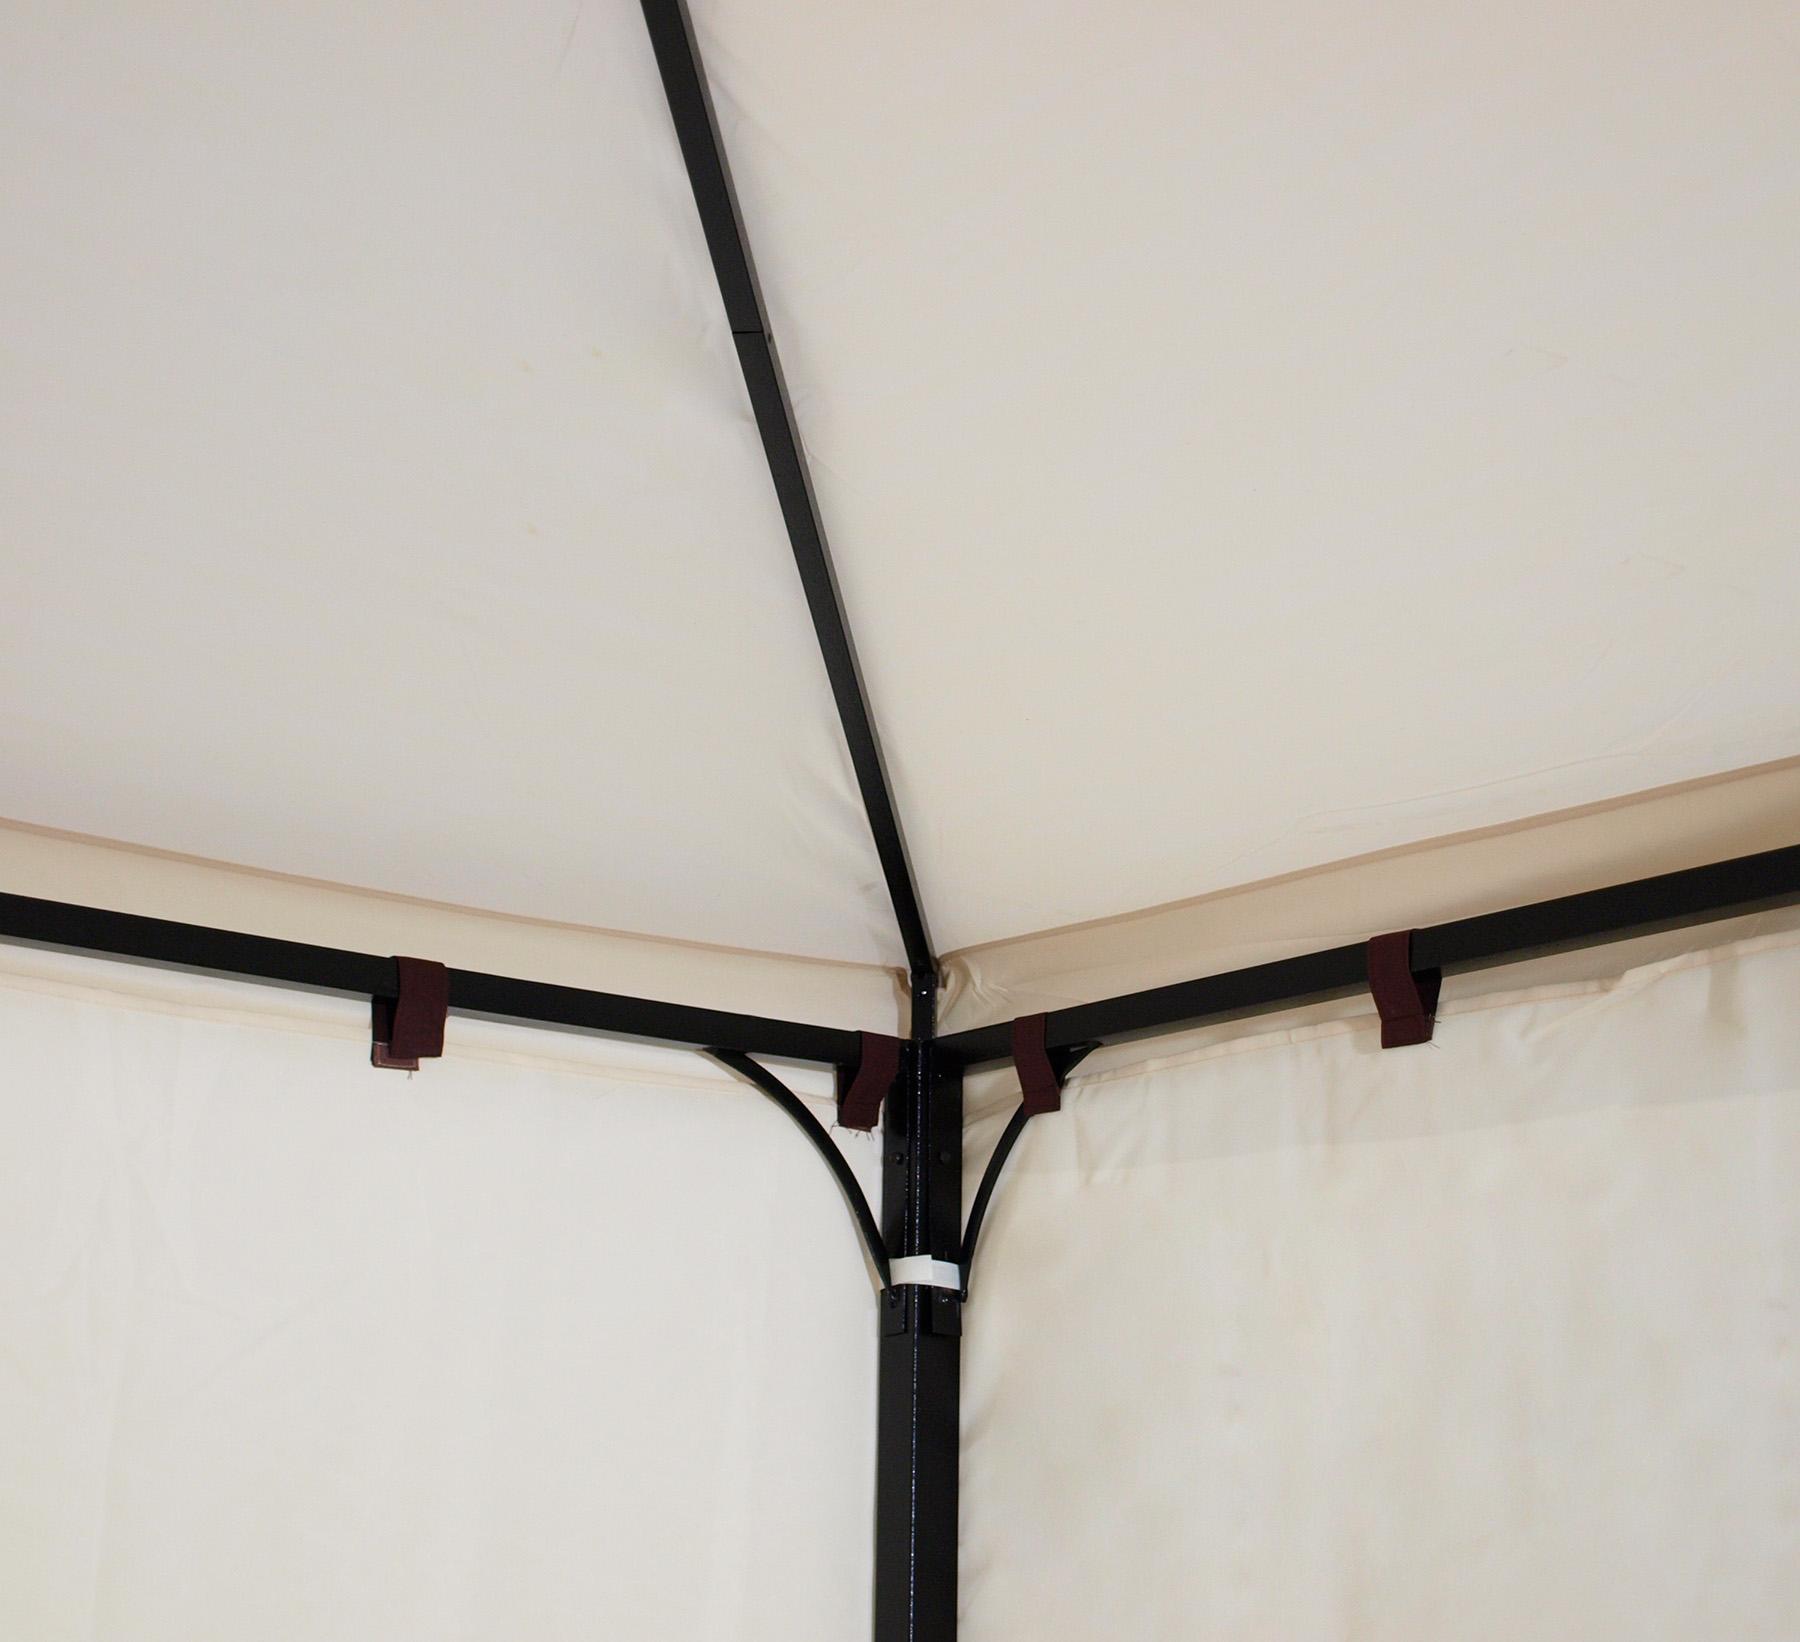 gartenpavillon pavillon metall gartenpavillion 3x3 meter. Black Bedroom Furniture Sets. Home Design Ideas